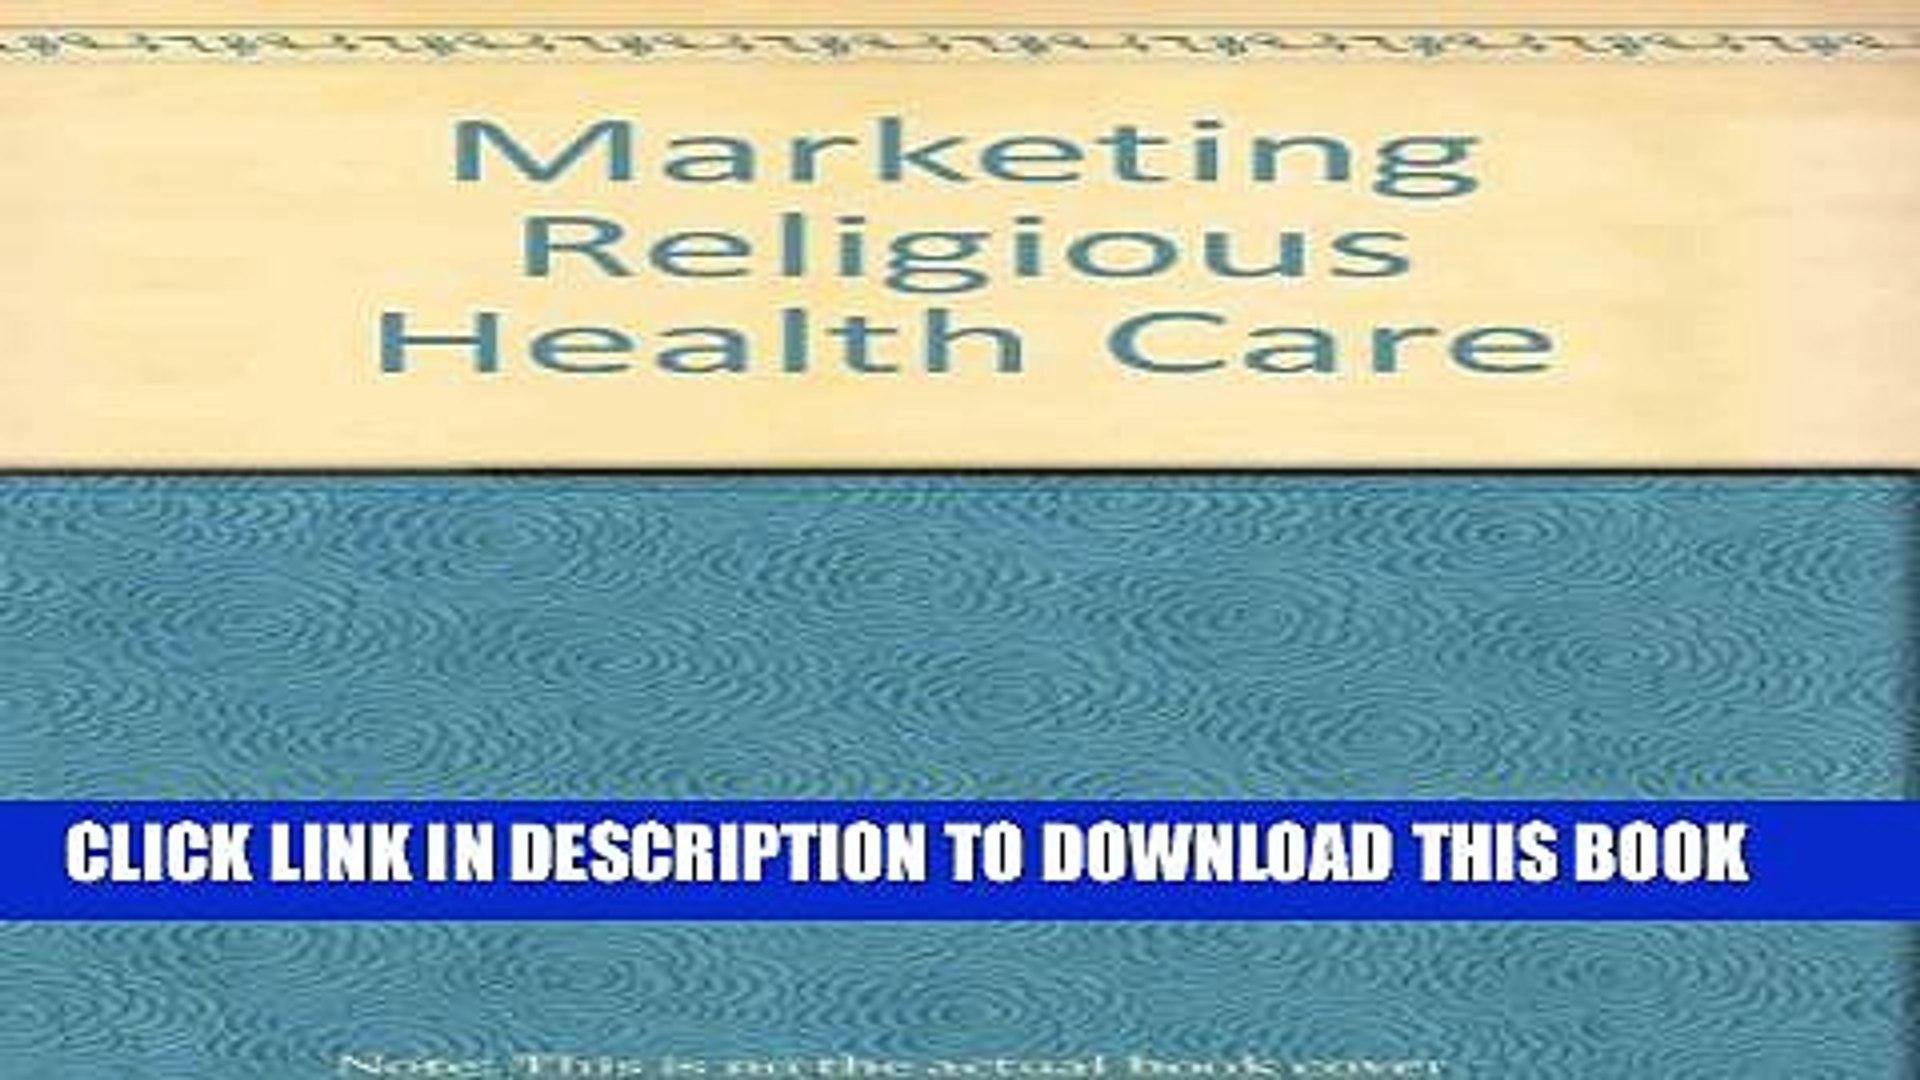 New Book Marketing Religious Health Care